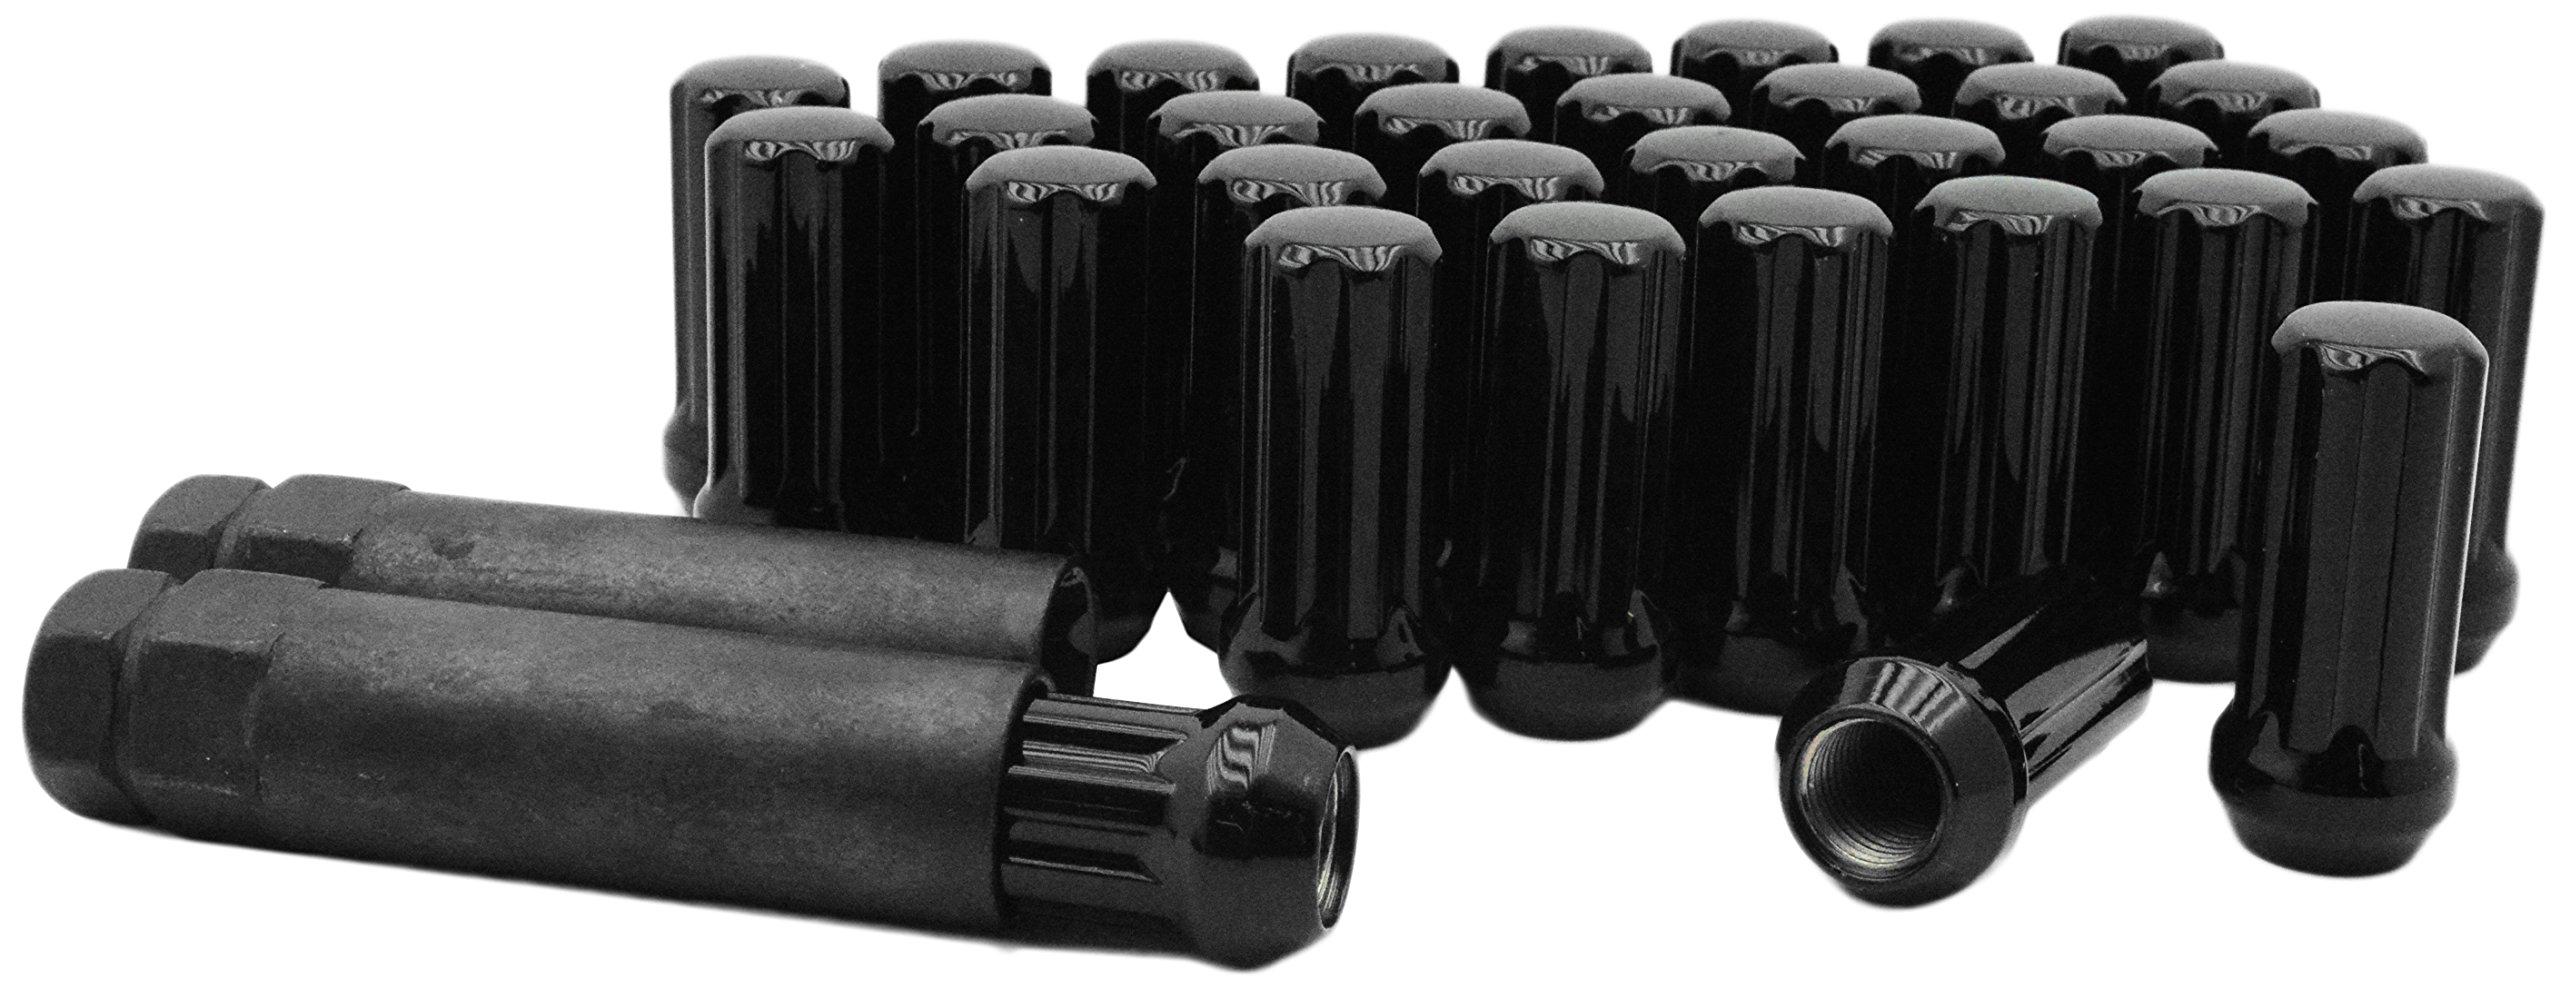 Venum wheel accessories 32 Pc Black 14x1.5 Spline Lug nuts For Aftermarket Wheels With 2 Keys Fits All Years Silverado's Sierra 8 Lugs 2500 3500